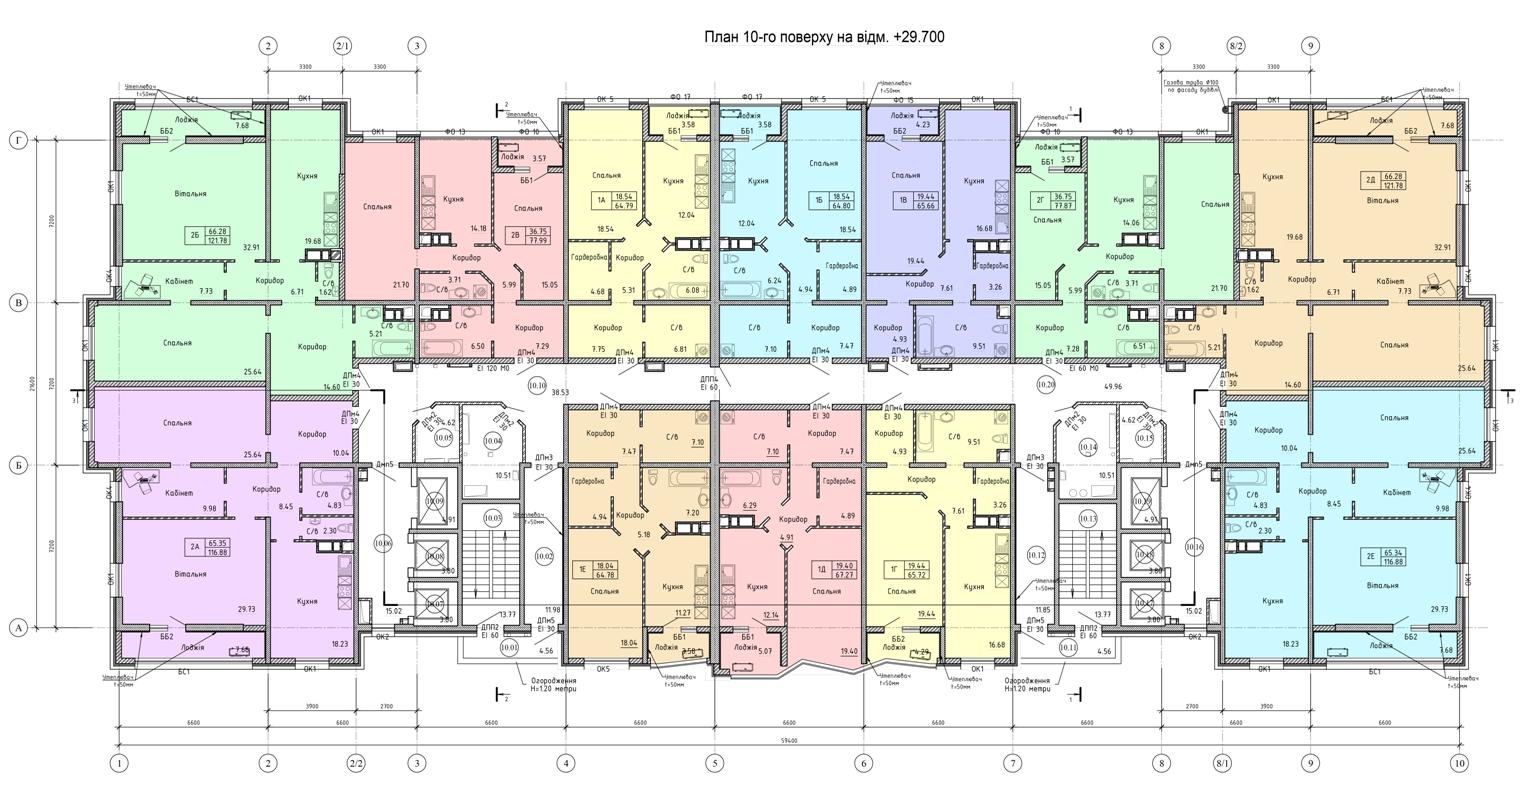 Олимпийский Комплекс апартаментов план 10 этажа